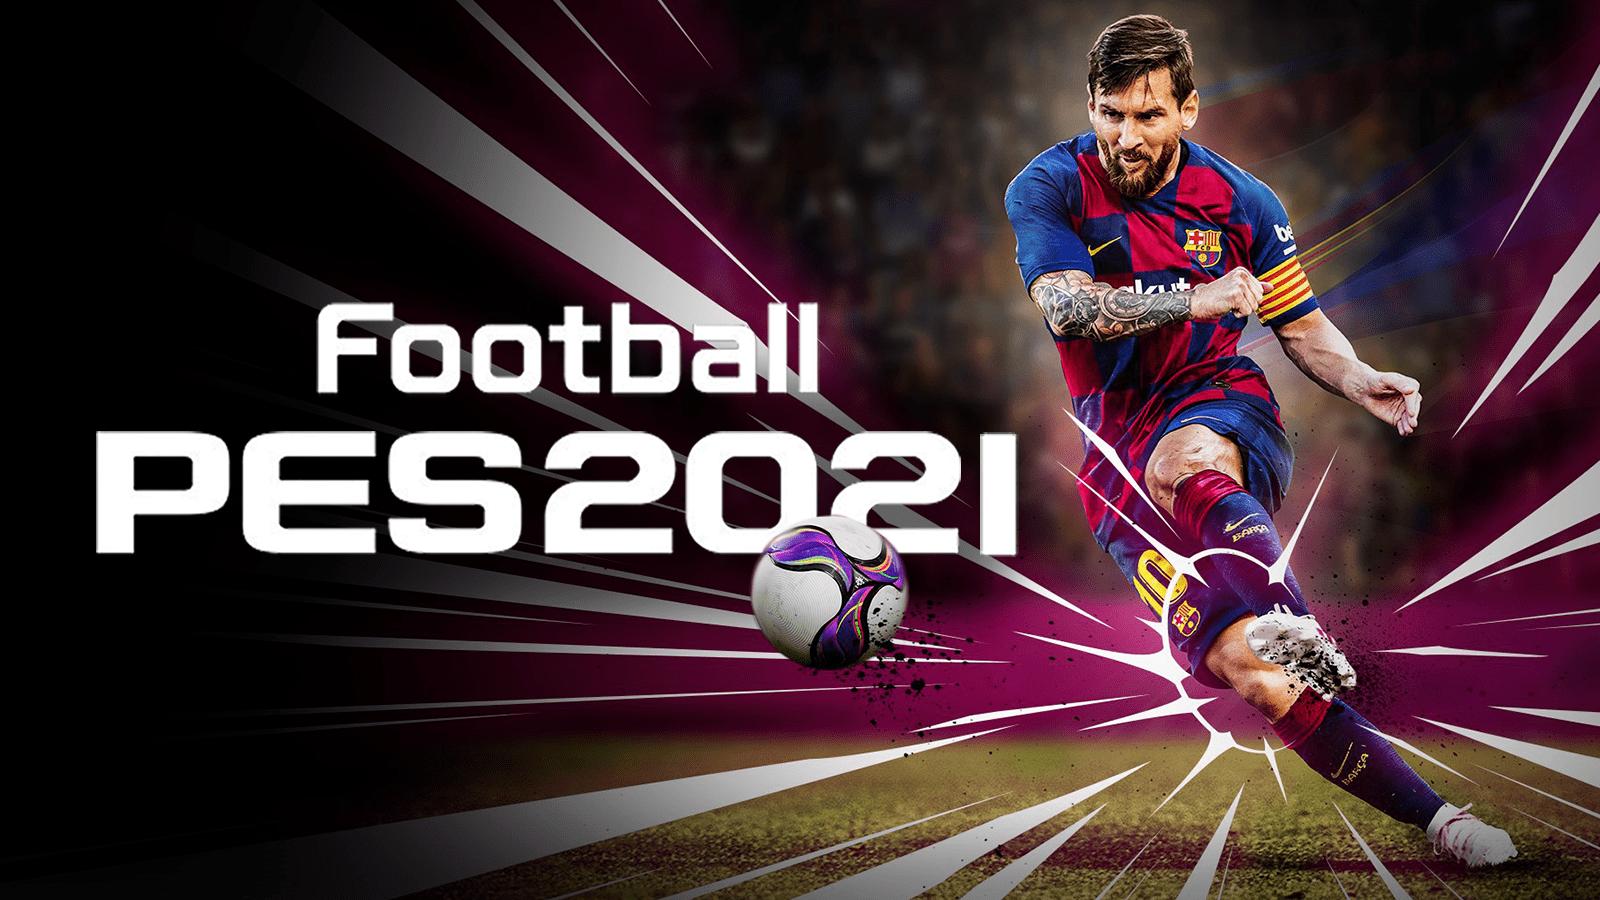 سی دی کی اریجینال استیم eFootball PES 2021 SEASON UPDATE